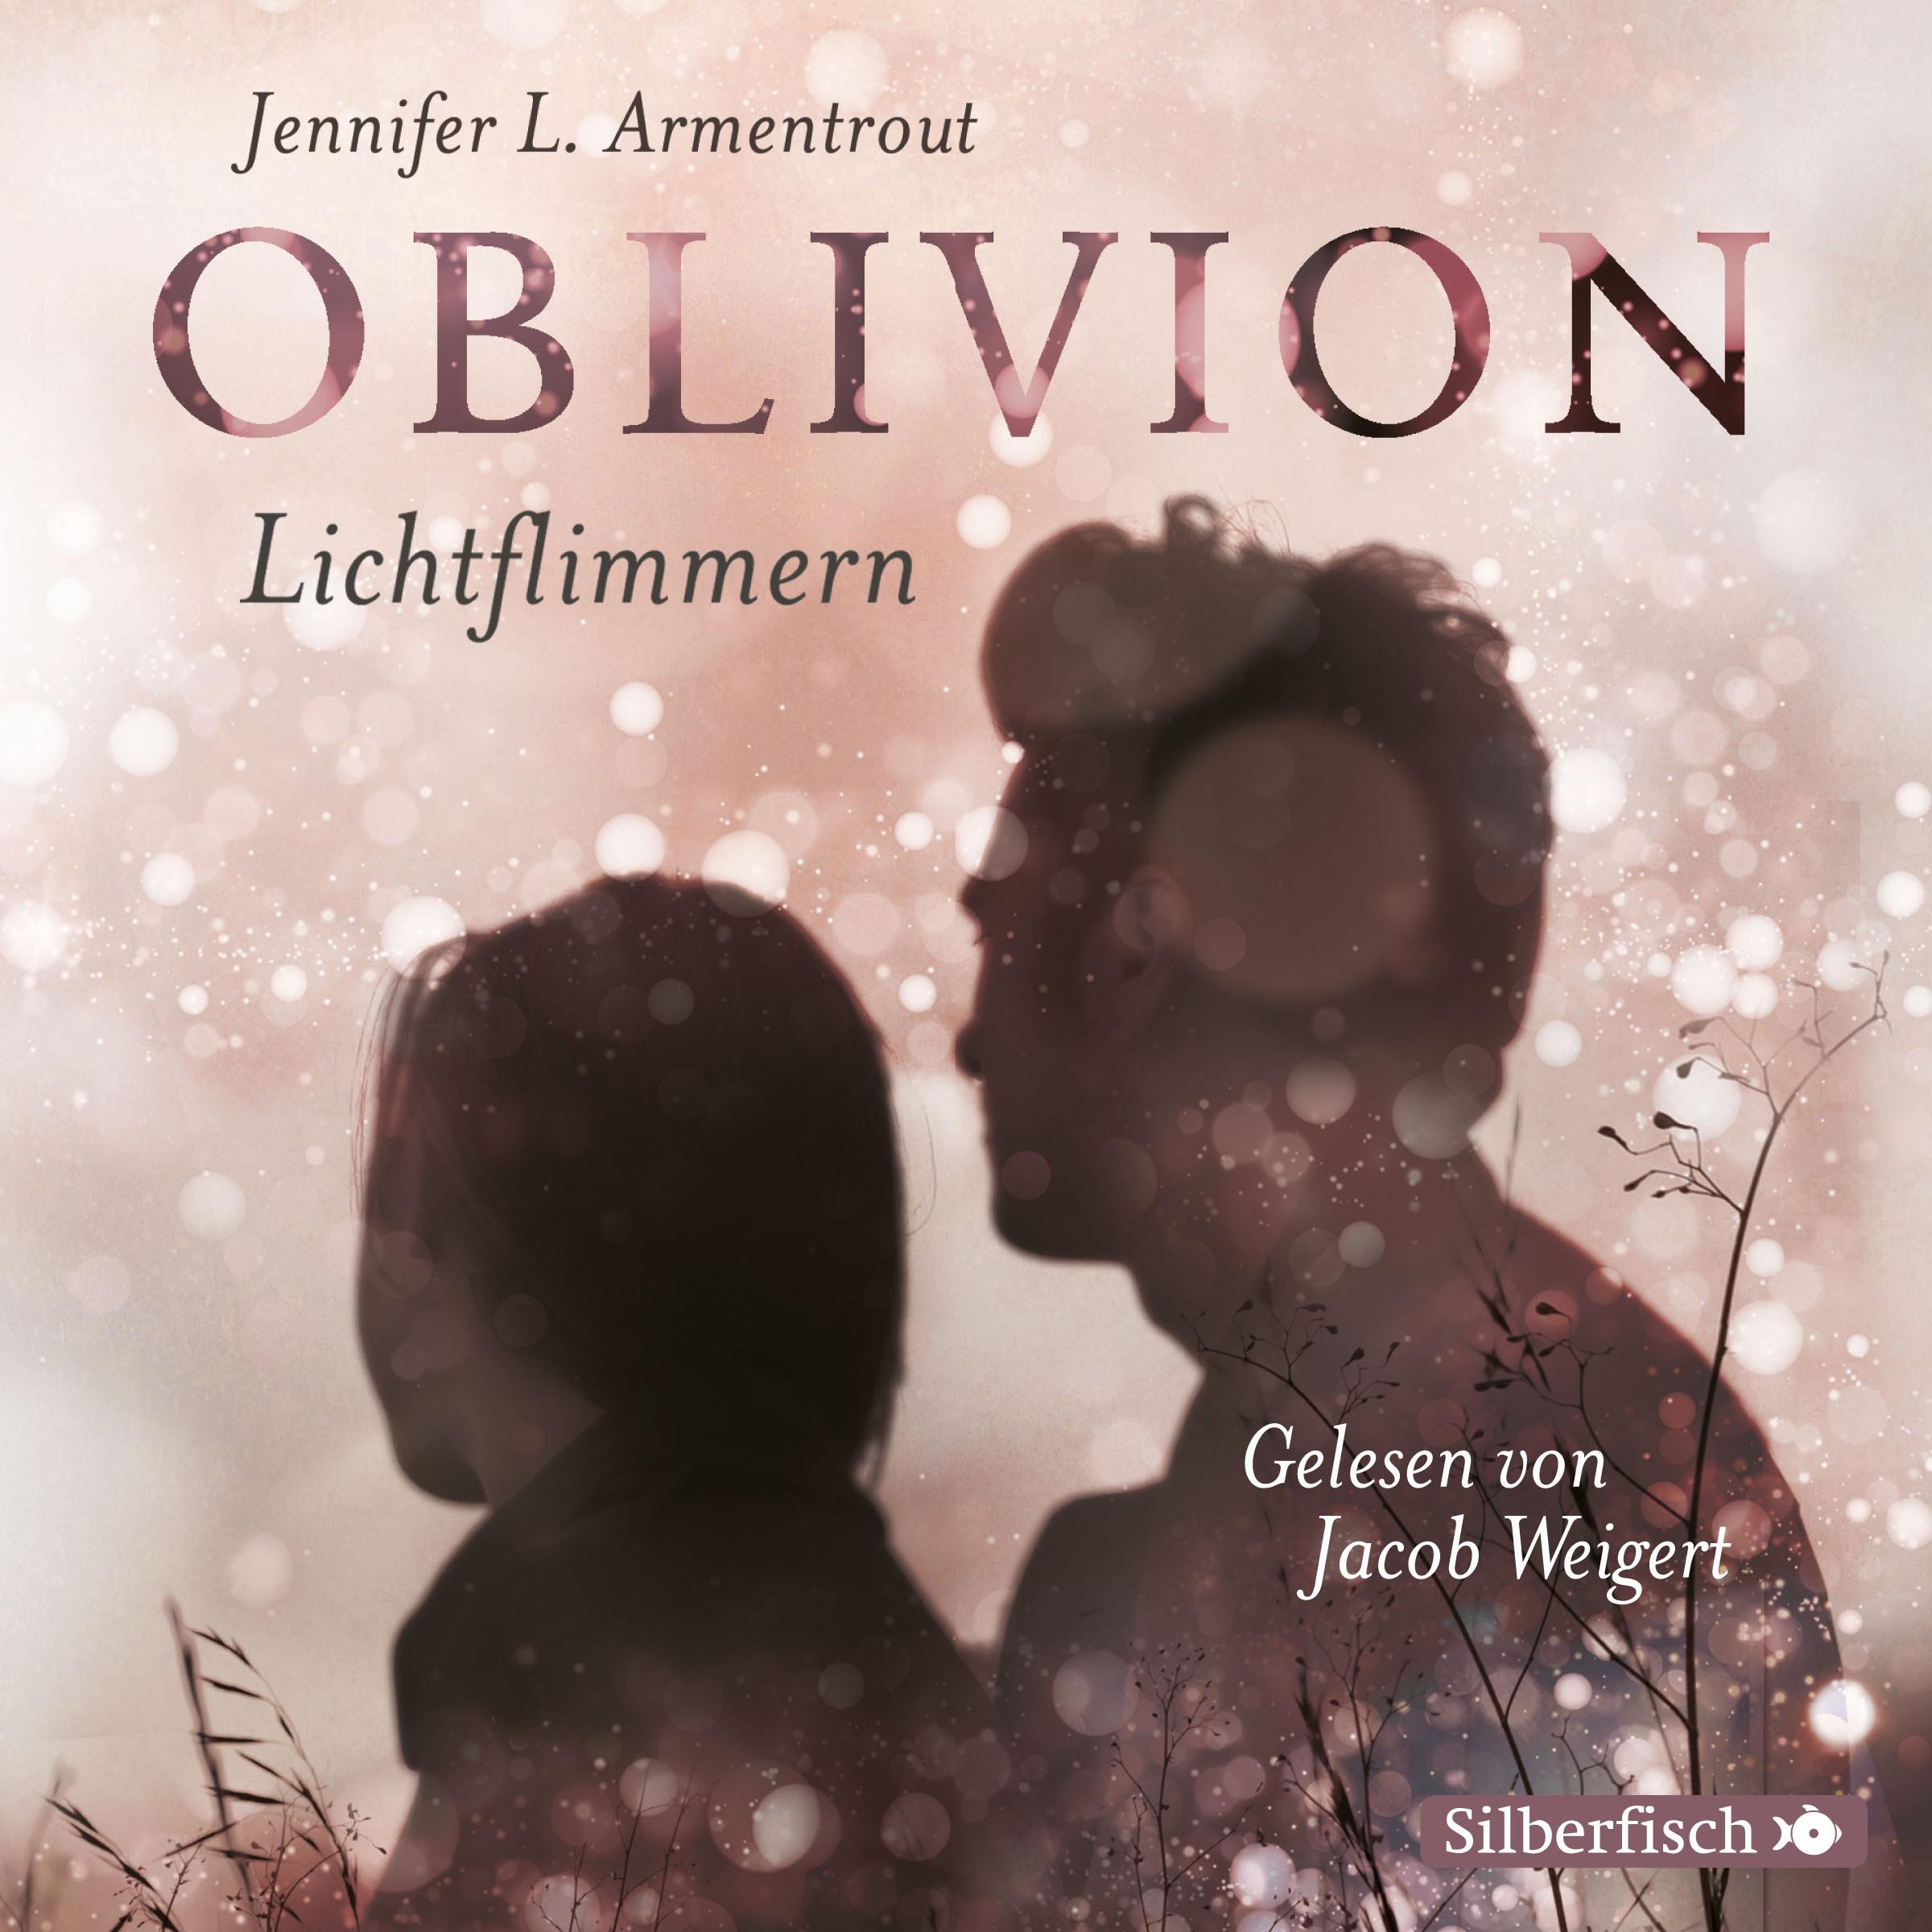 Jennifer L. Armentrout - Oblivion 2. Lichtflimmern (Obsidian)